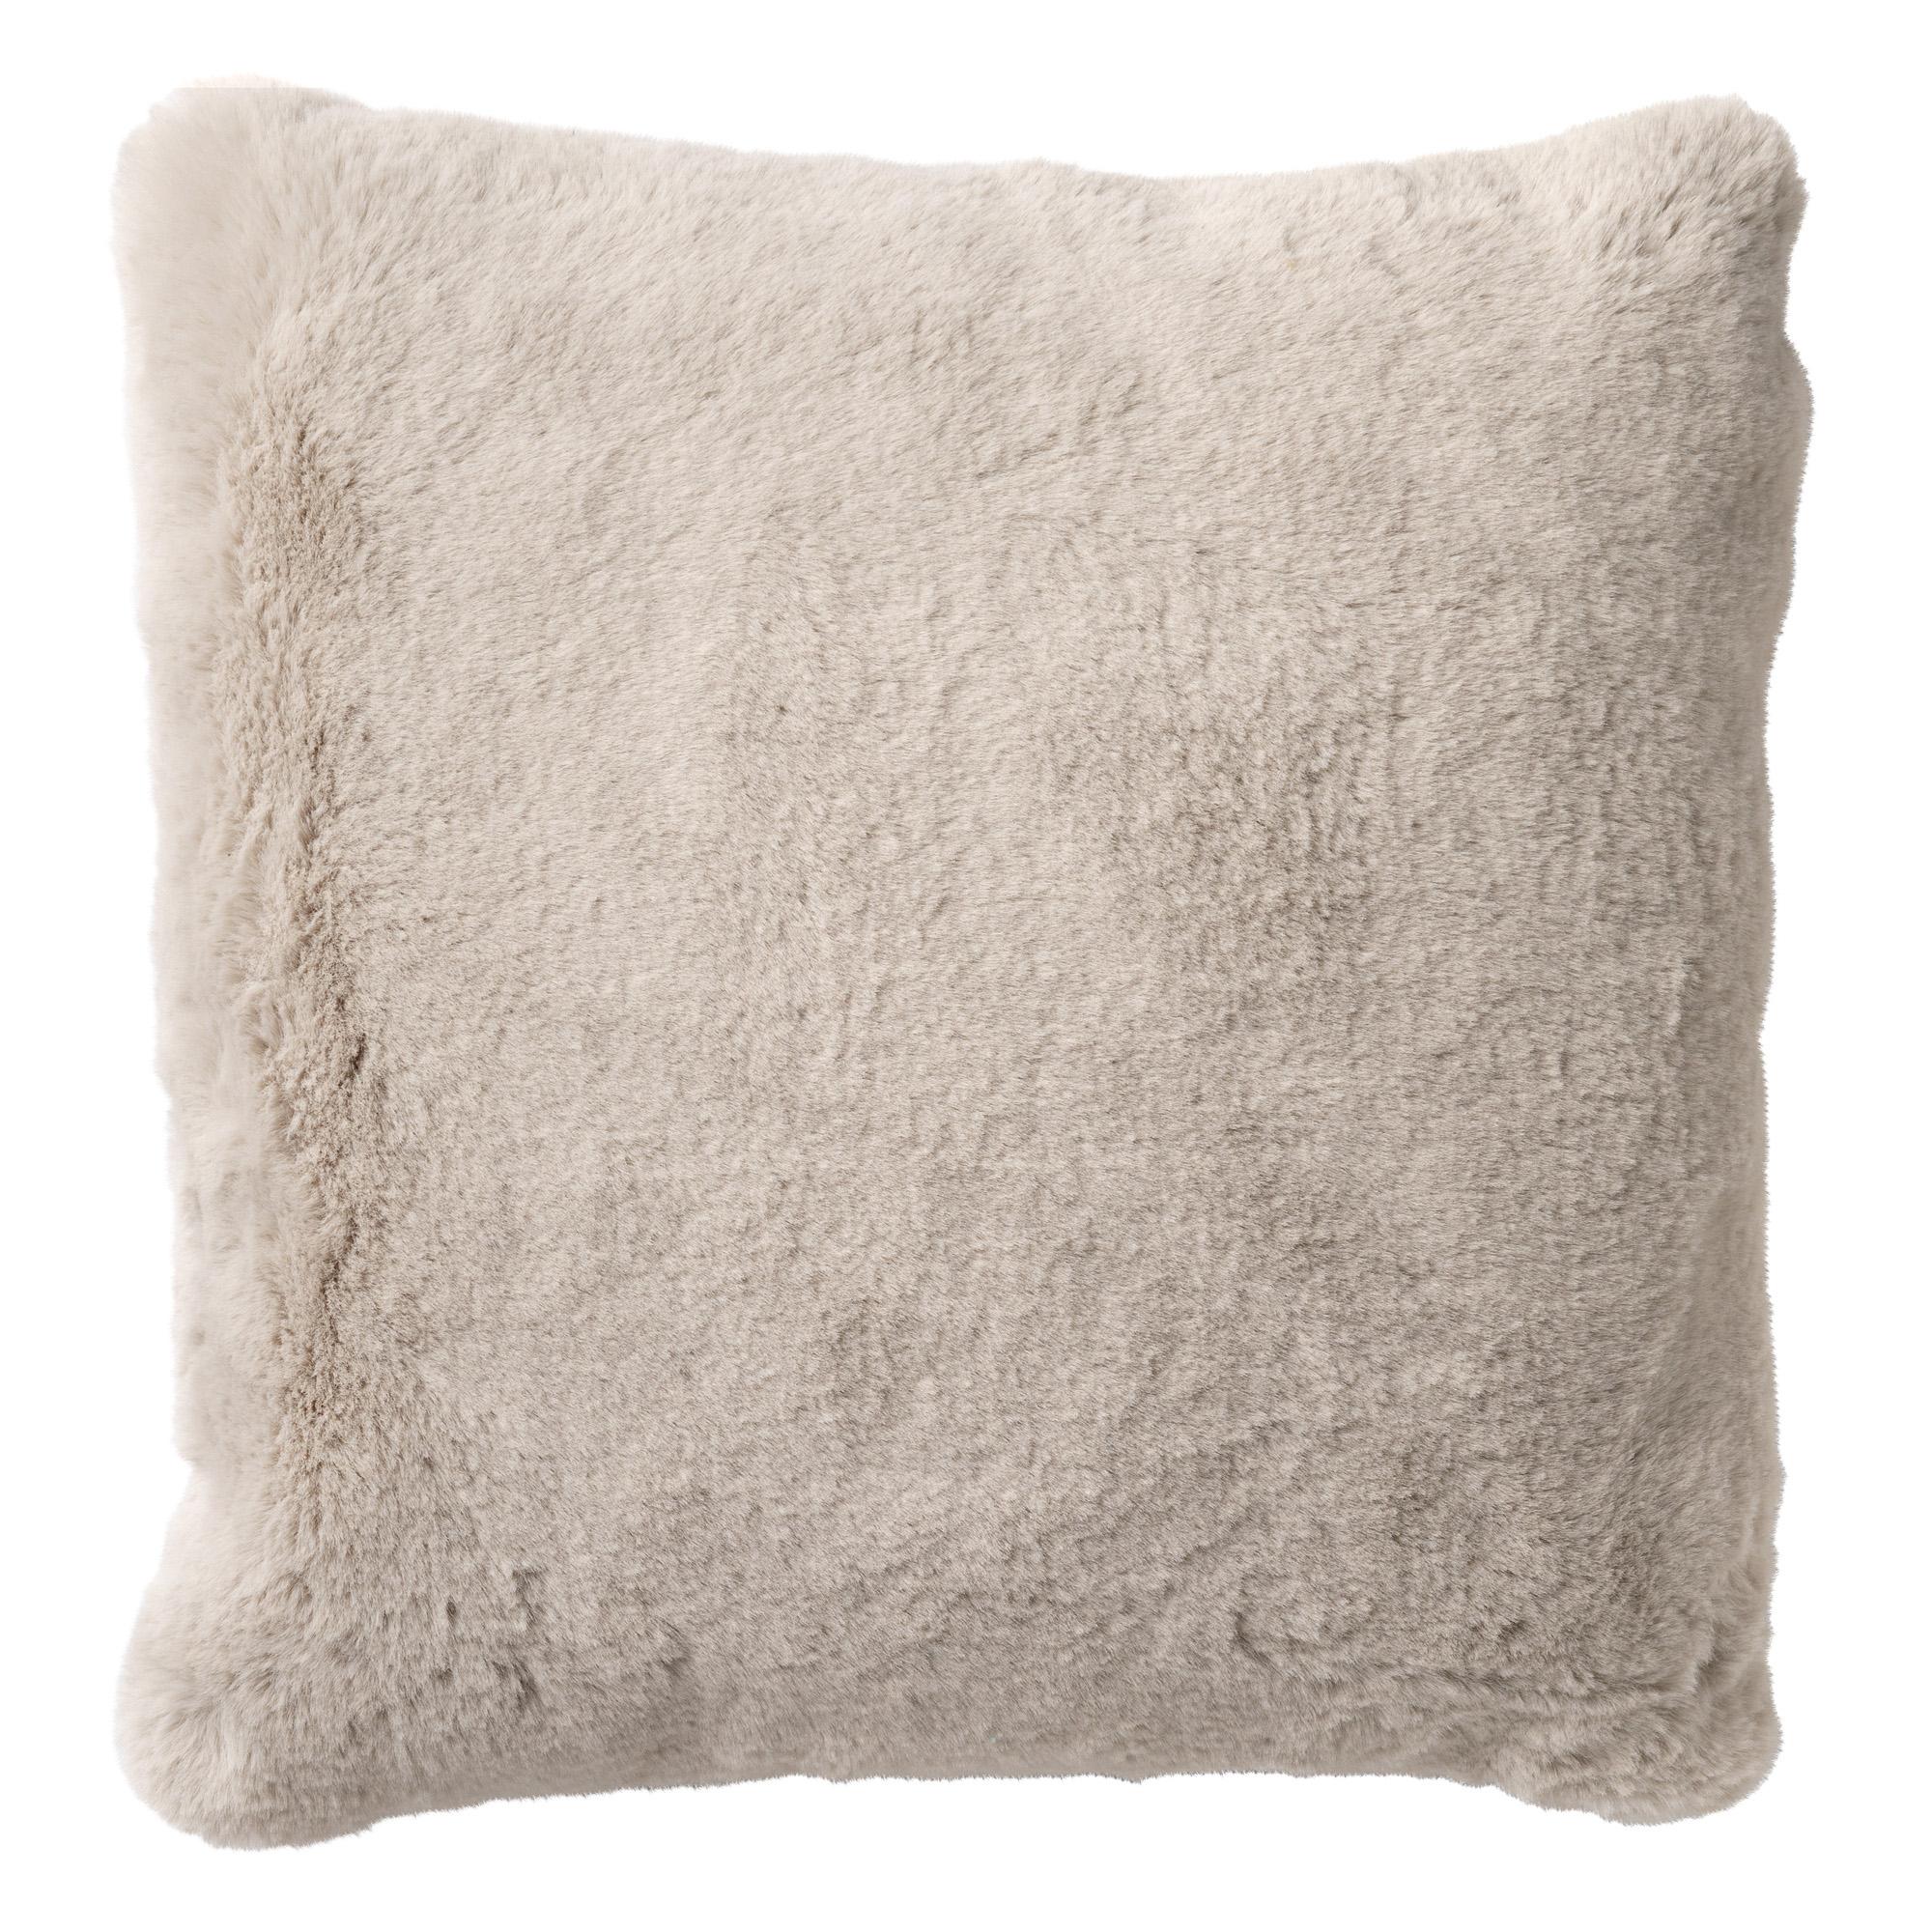 ZAYA - Sierkussen unikleur 60x60 cm Pumice Stone